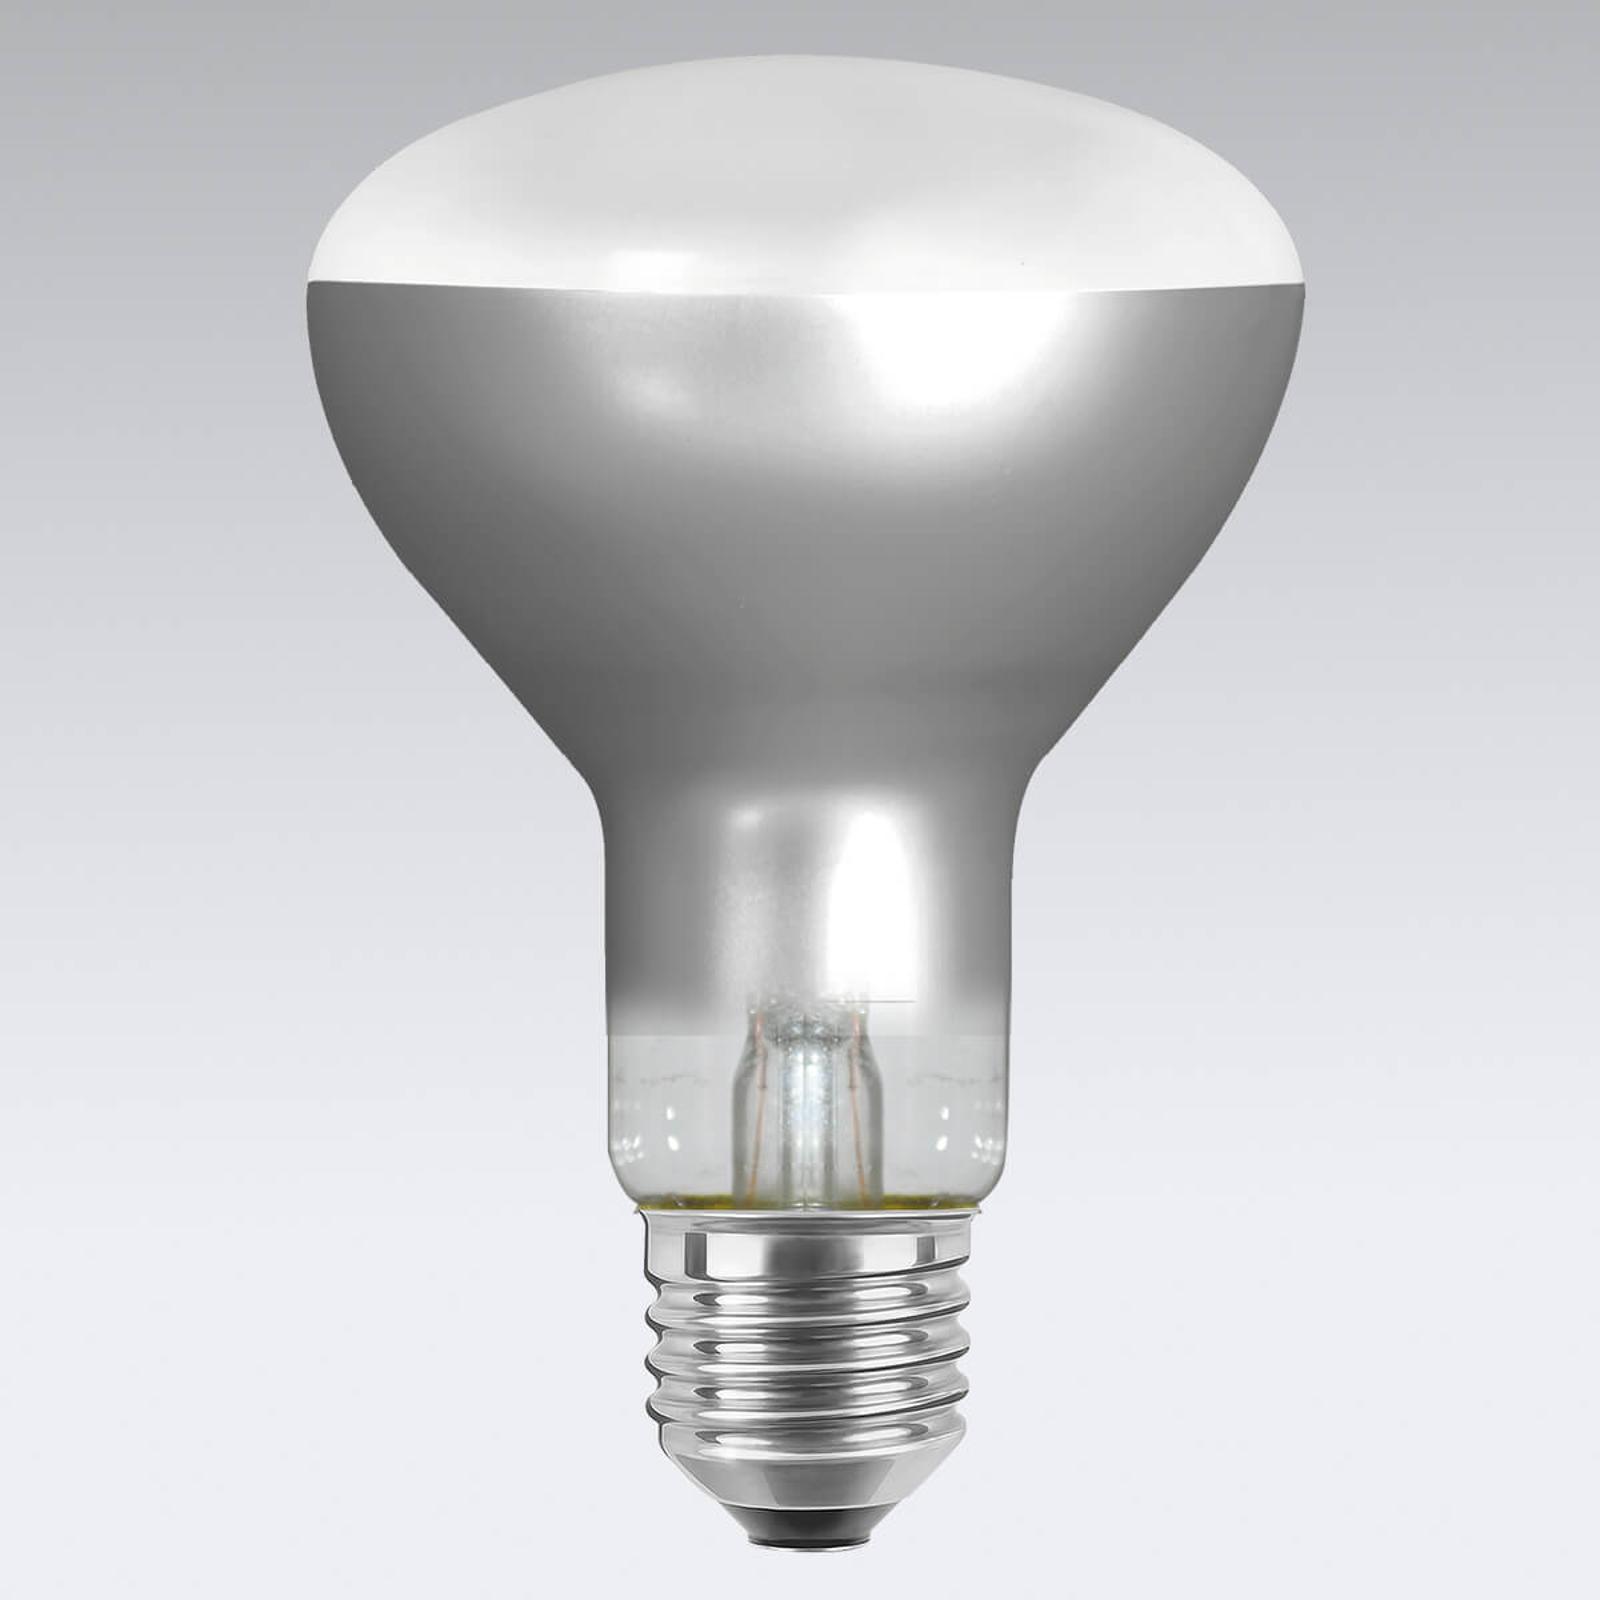 SEGULA LED-Reflektor E27 8W ambient dimming matt